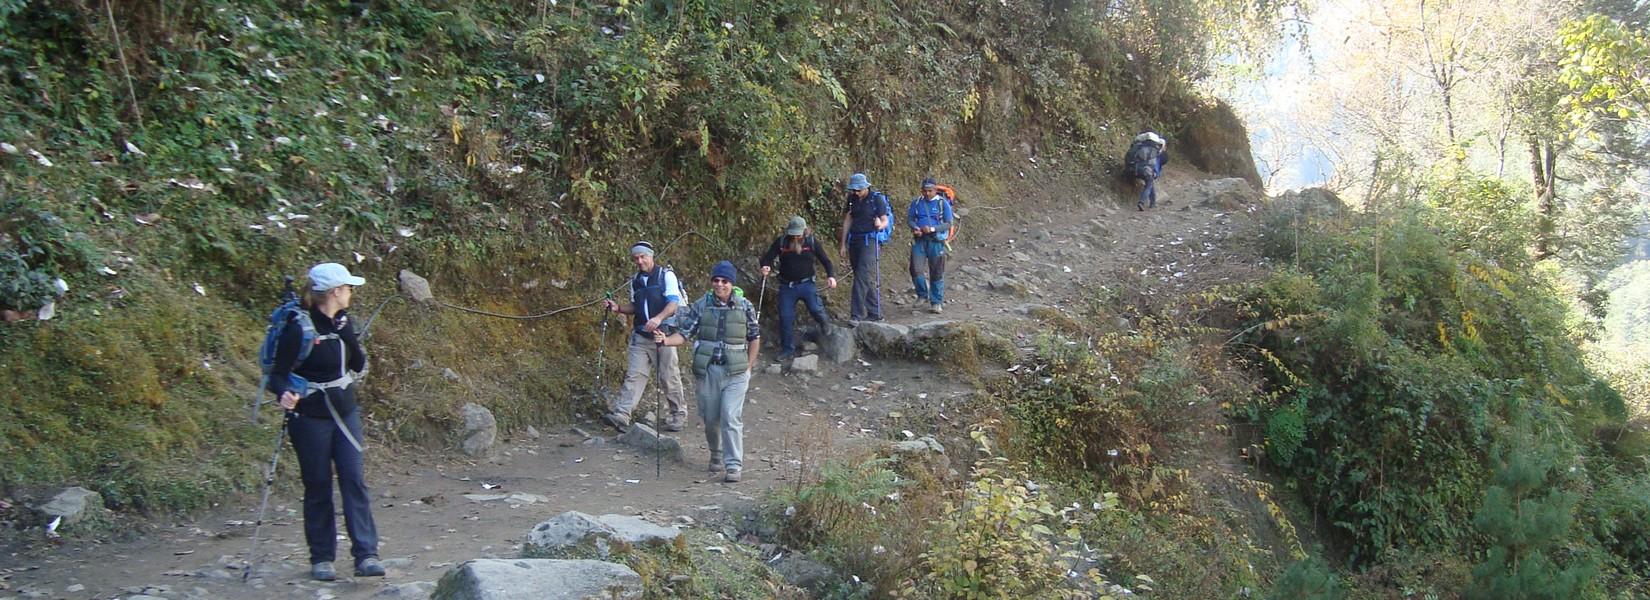 Complete Guide Trek to Everest Base Camp